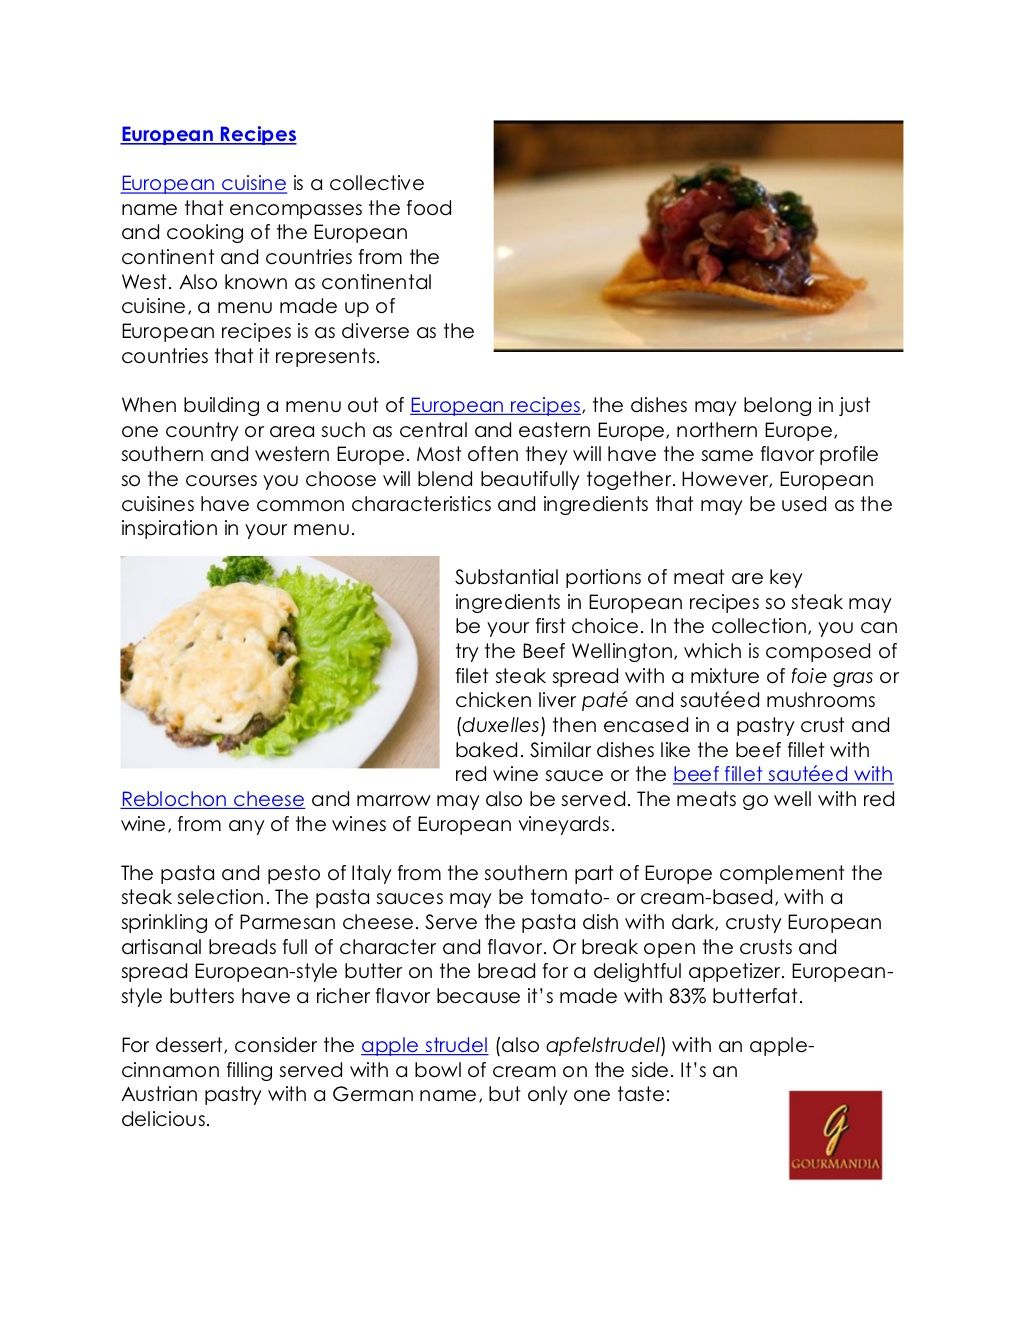 European Recipes By Catalina Linkava Via Slideshare European